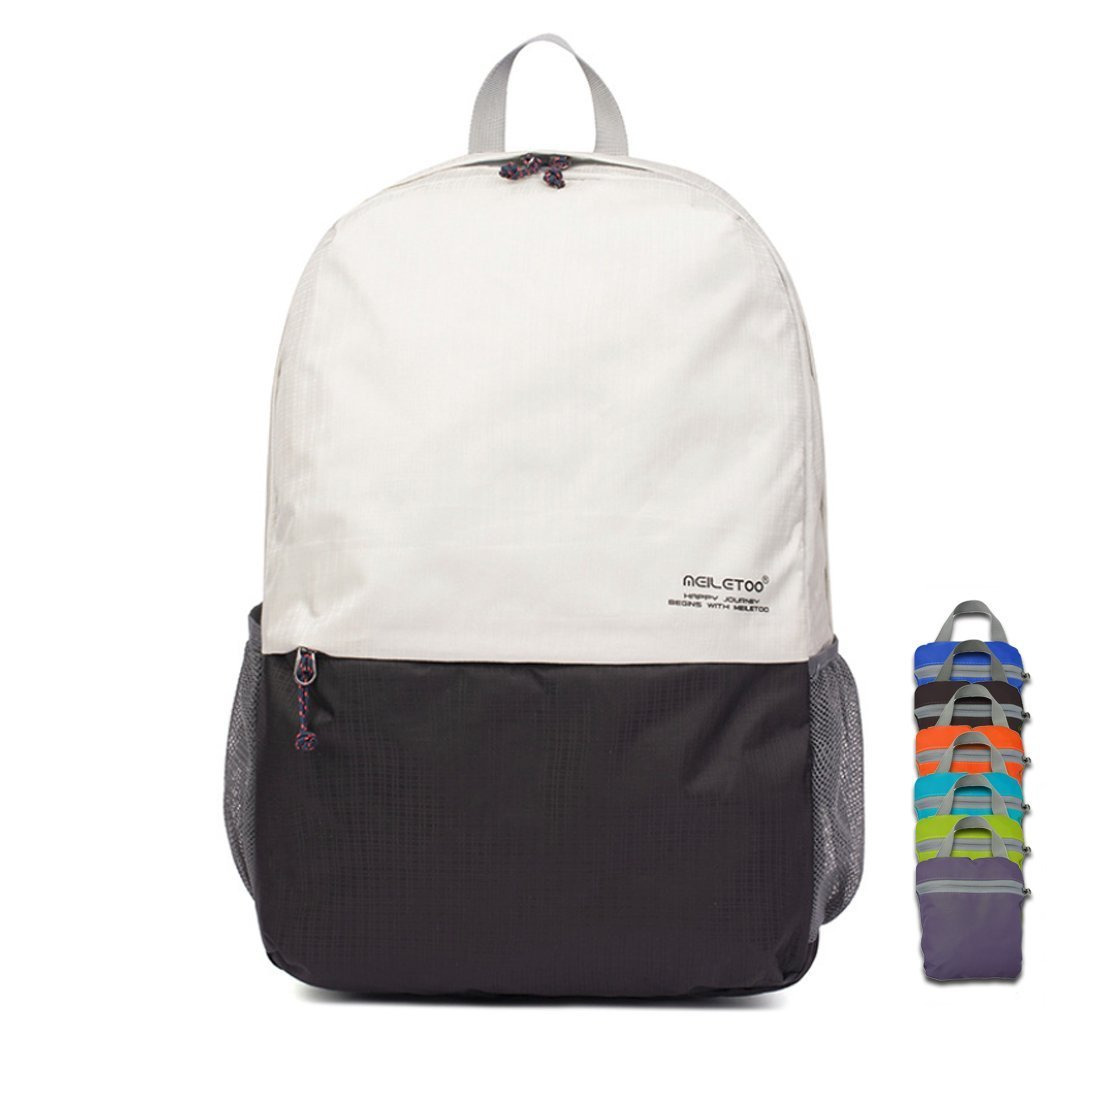 Bagspert Slim Business Laptop Backpack for Women Men Travel Waterproof Daypack